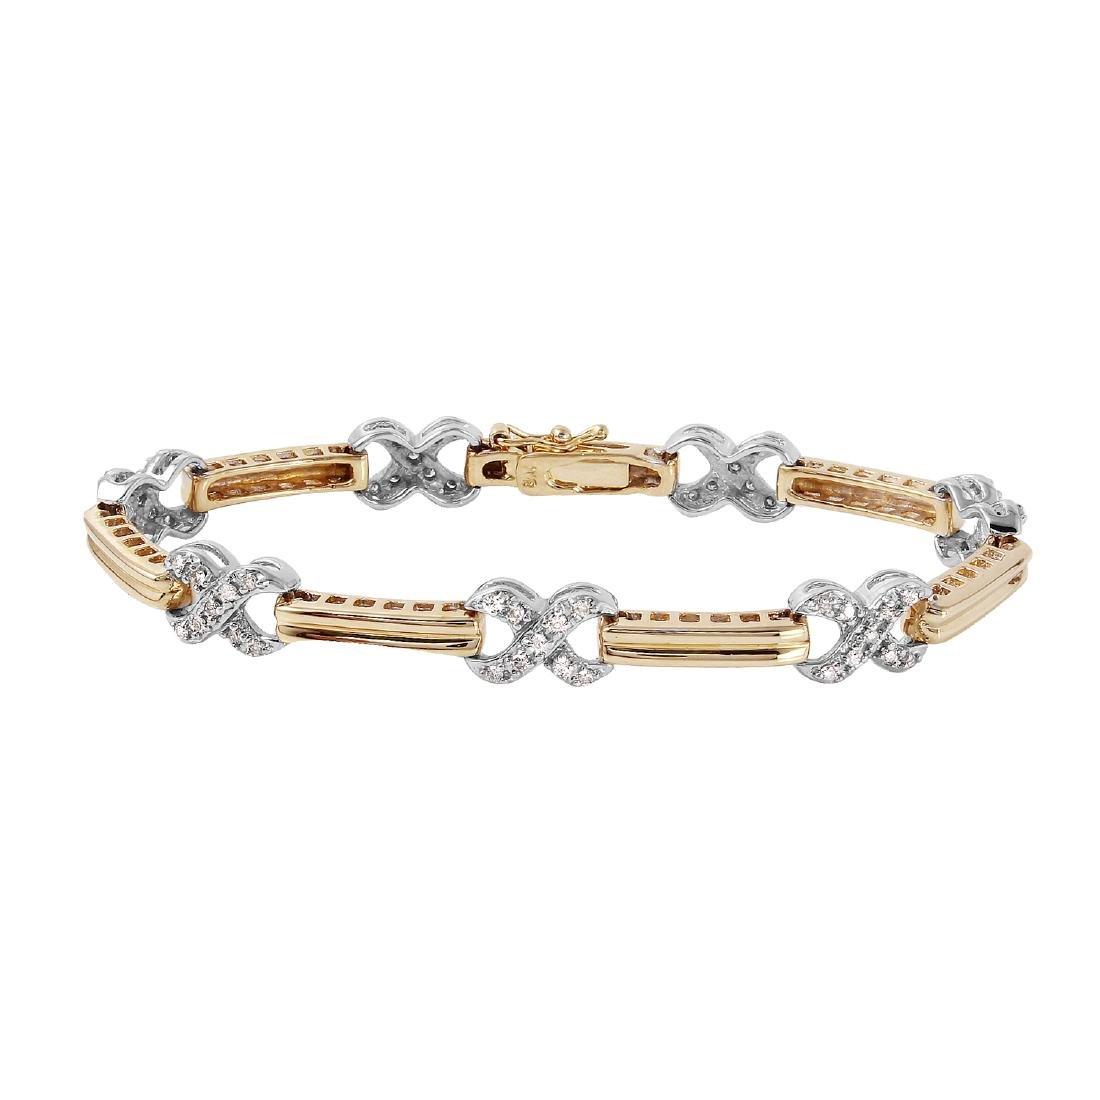 14KT Two Tone Gold Diamond Bracelet - 3